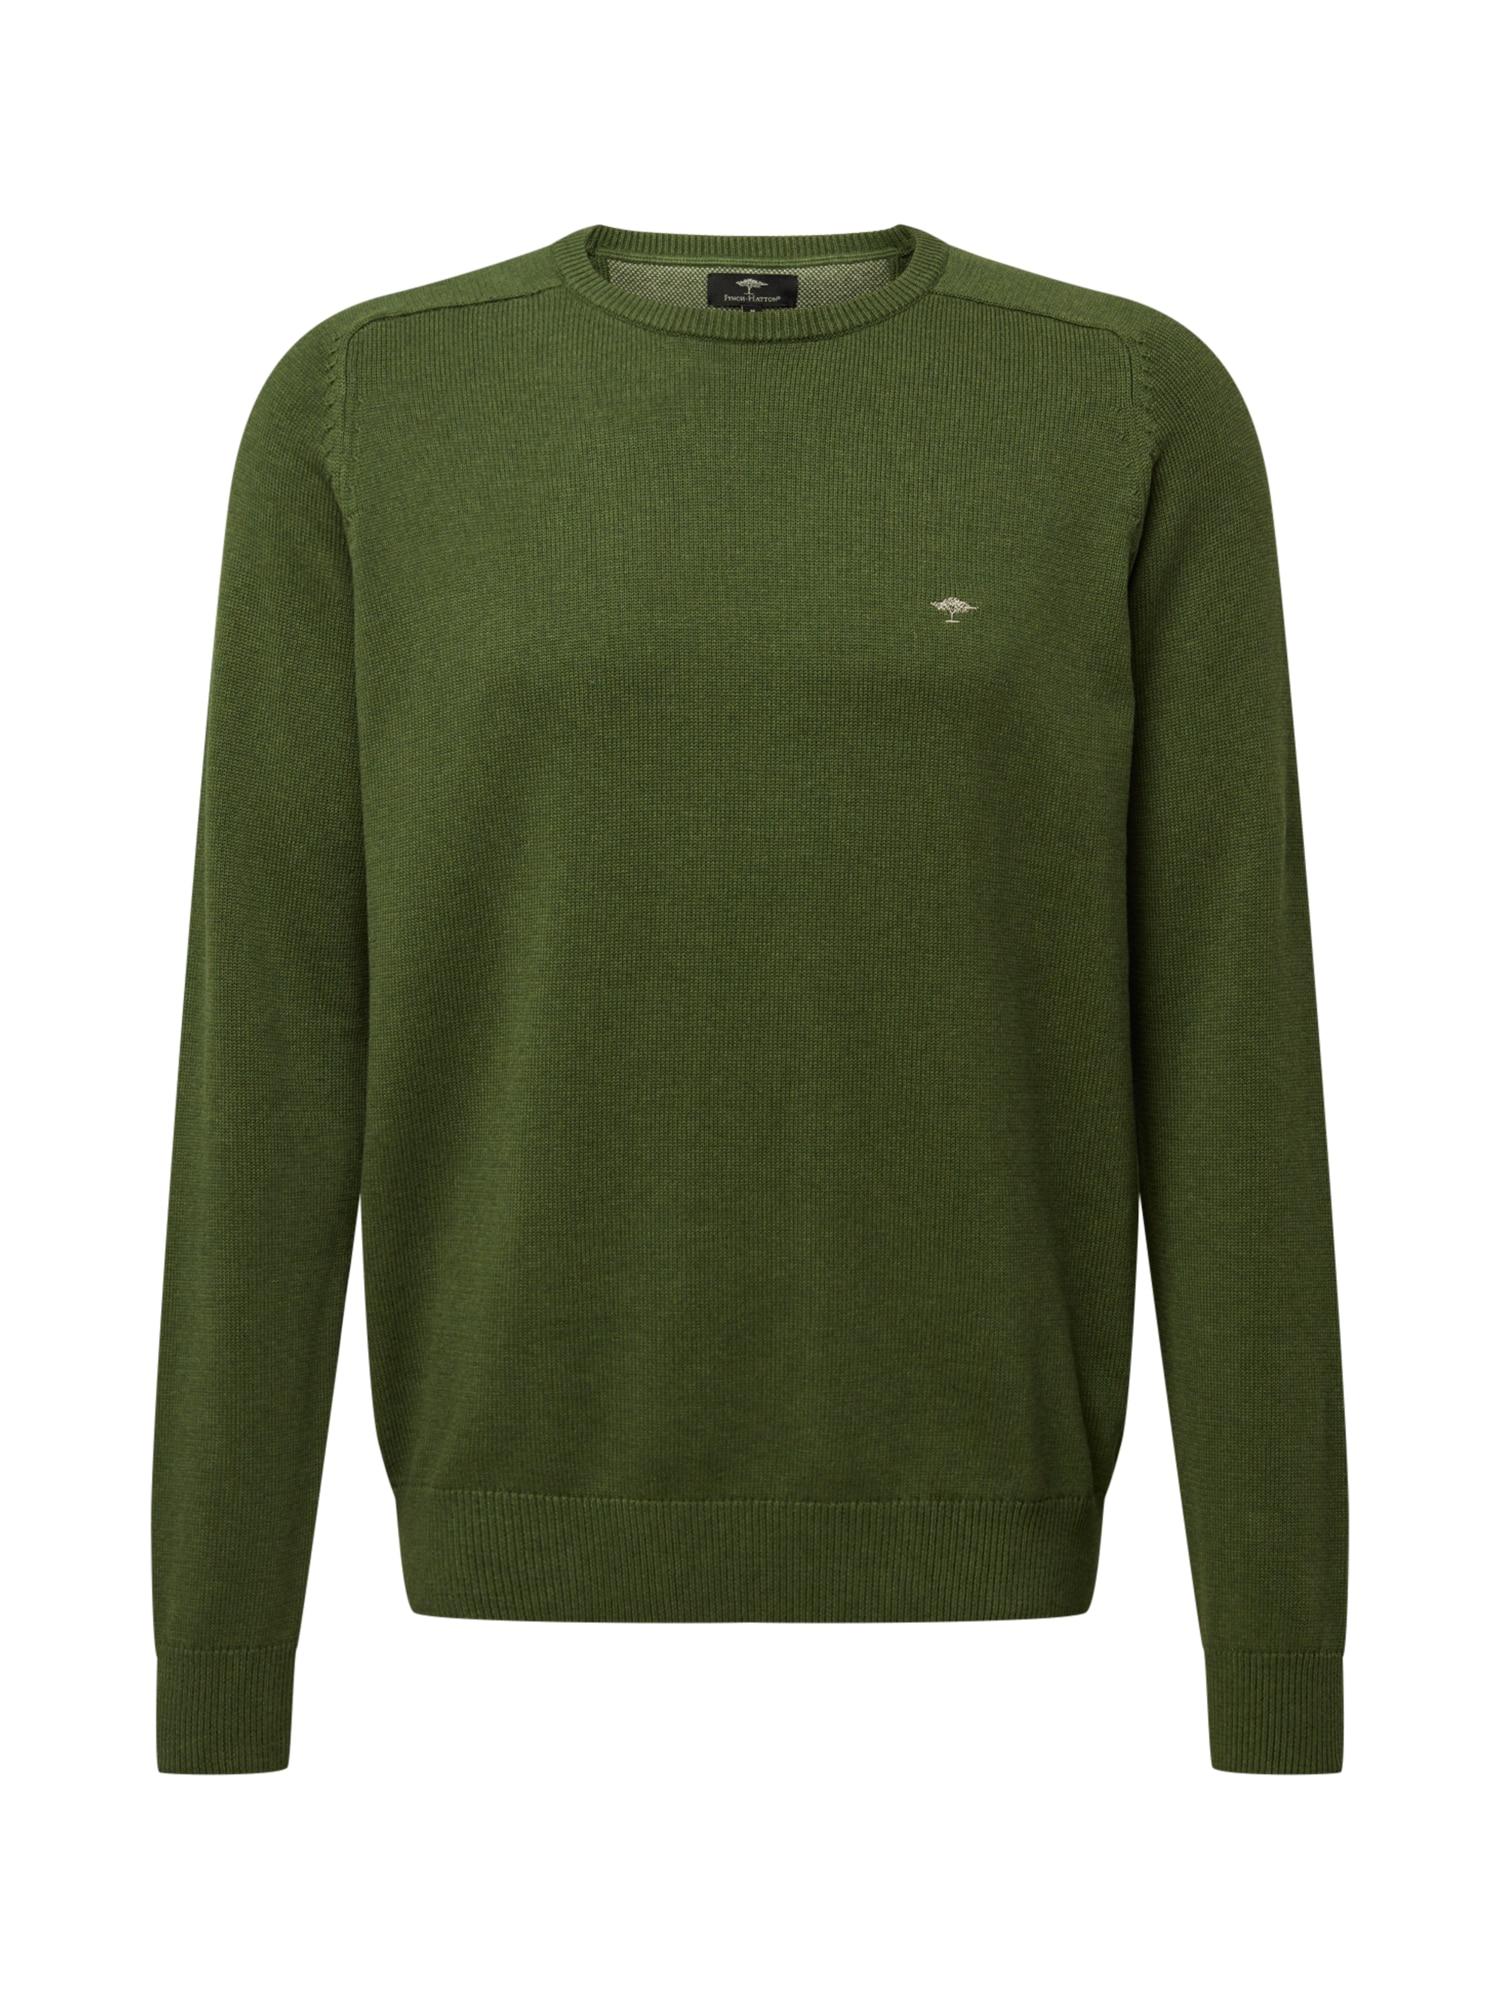 FYNCH-HATTON Megztinis žolės žalia